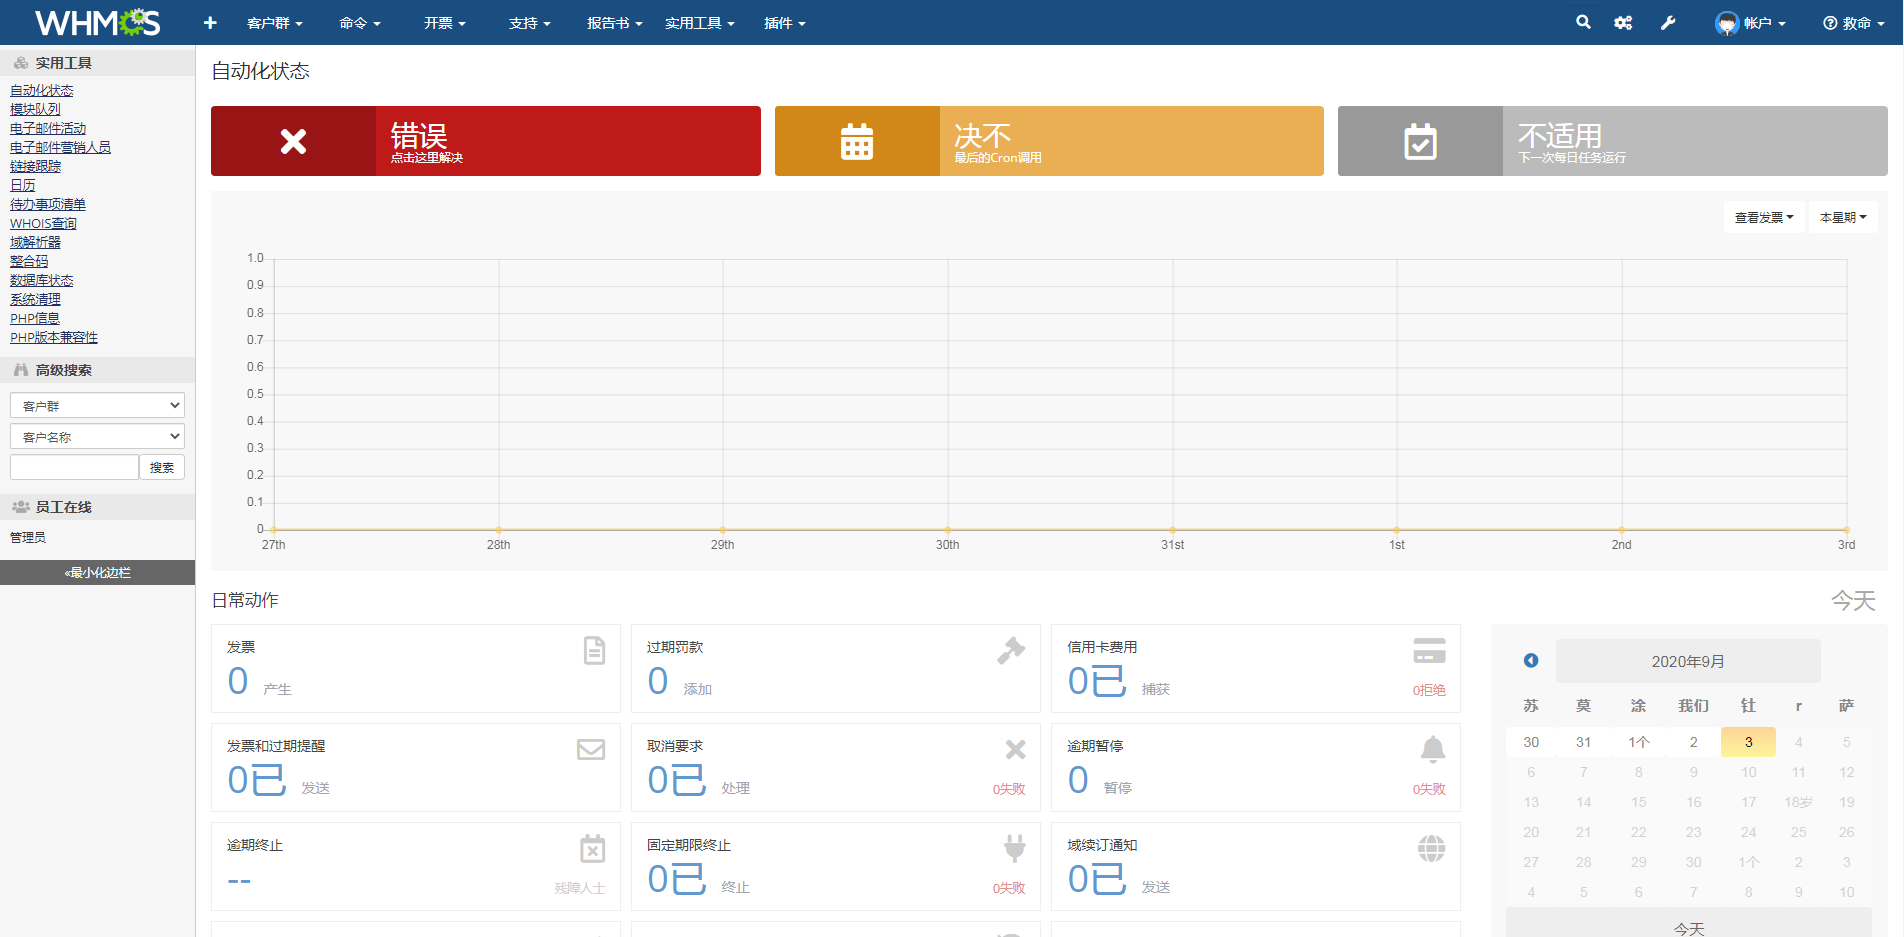 WHMCS v8.0 bate1开心版免费下载-常网小站Miknio